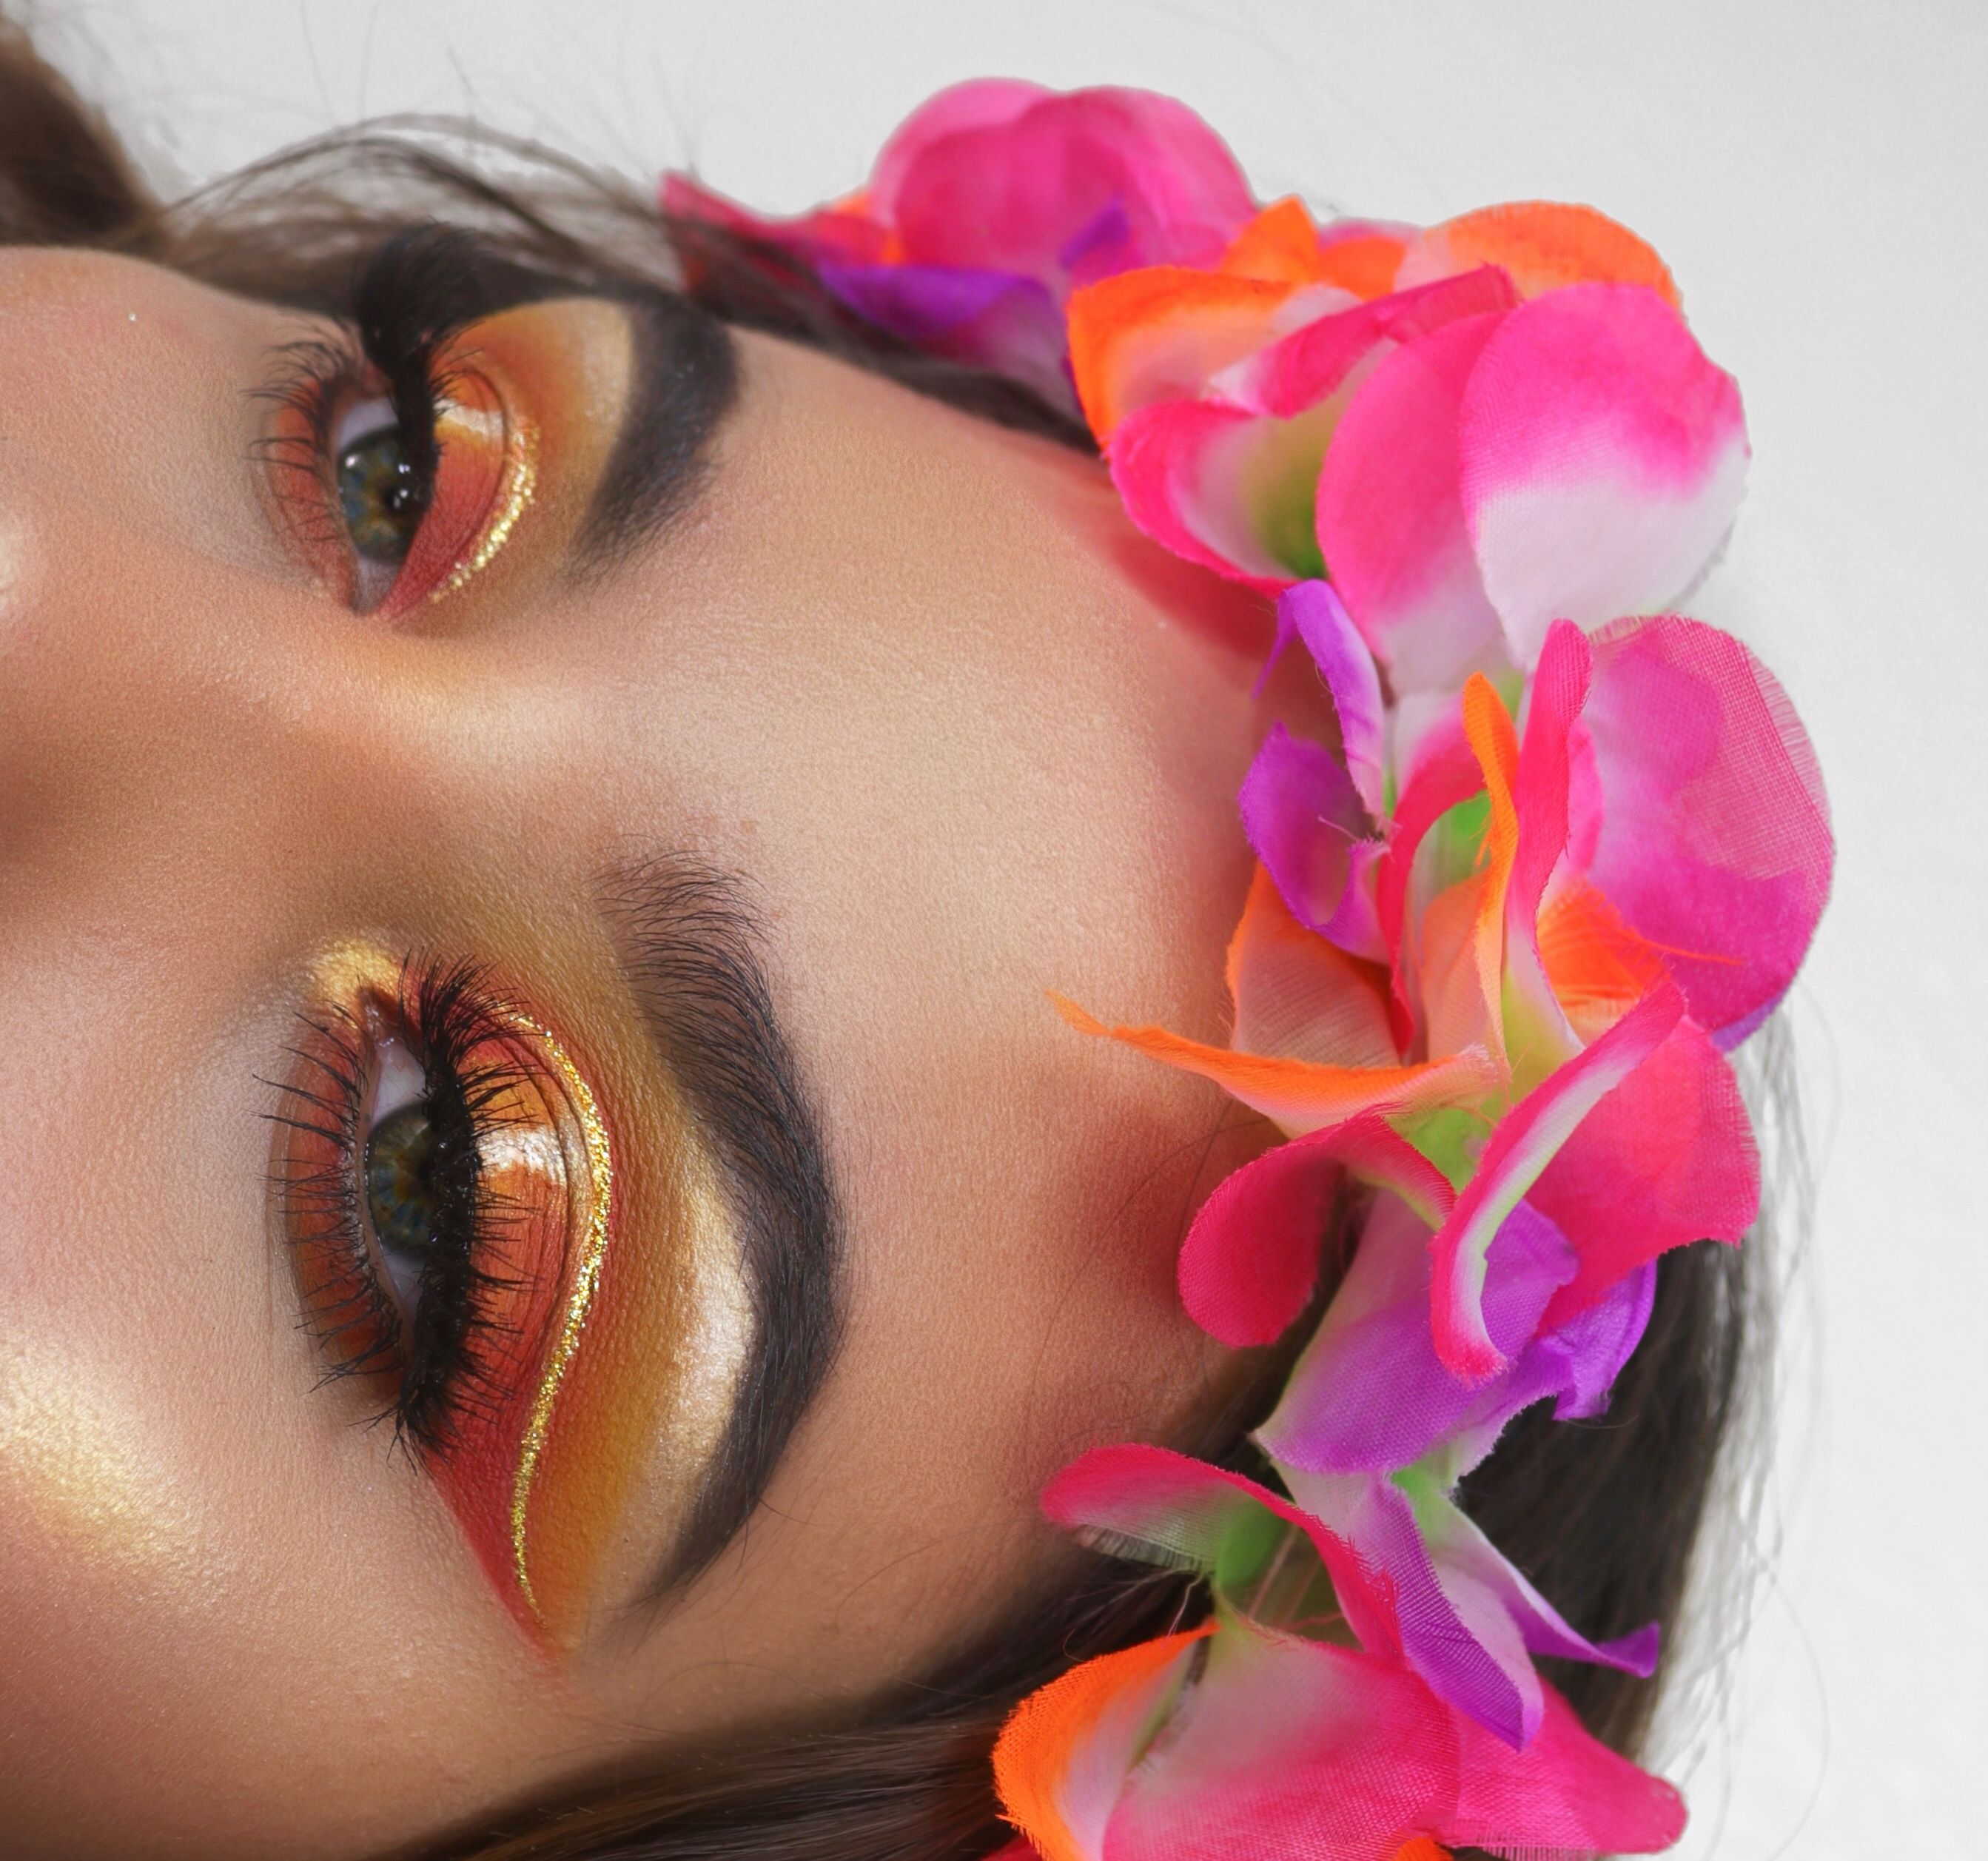 Morphe X James Charles palette glitter eyeshadow | Make up in 2019